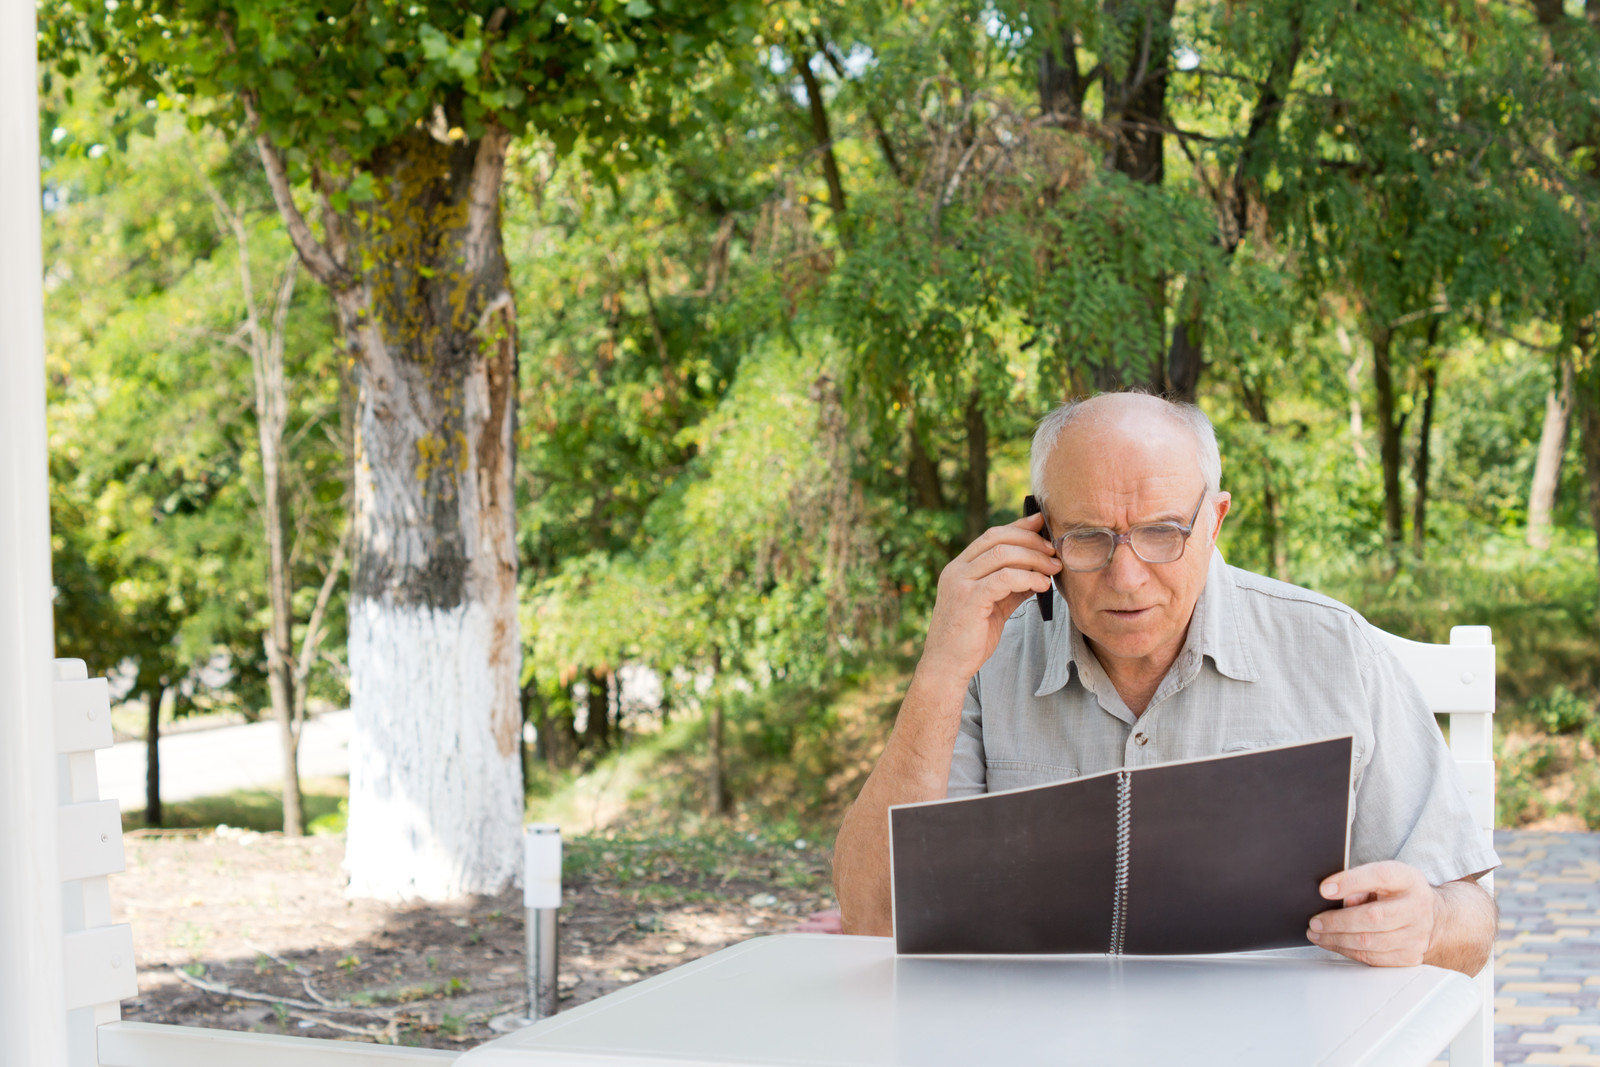 Senior man sitting outside at his table looking at a manual on his phone